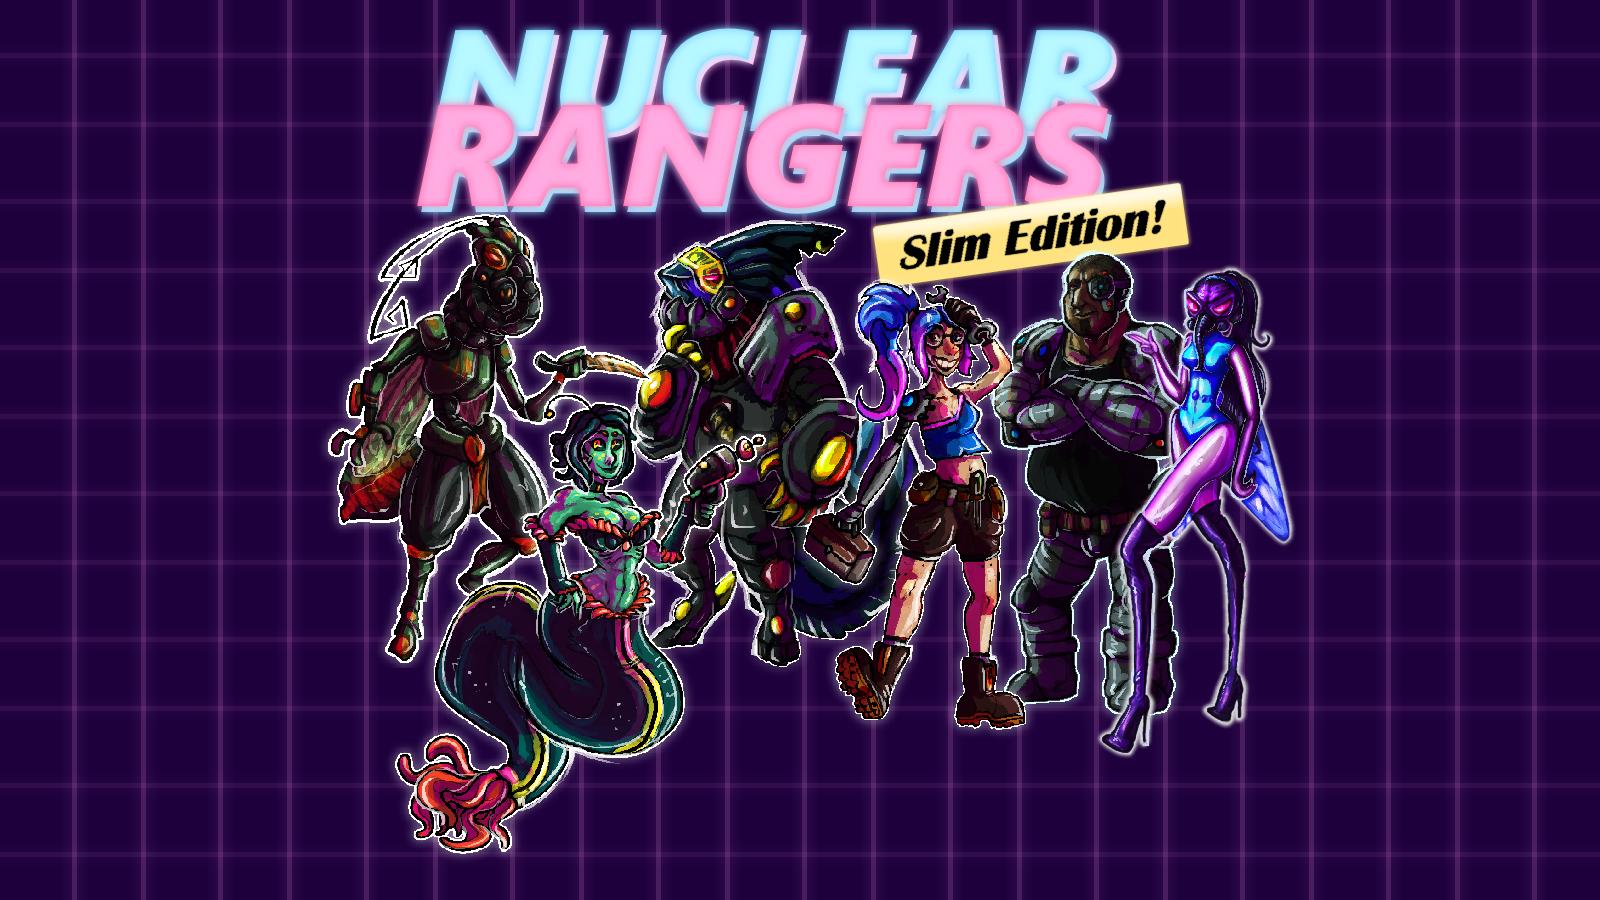 Nuclear Rangers